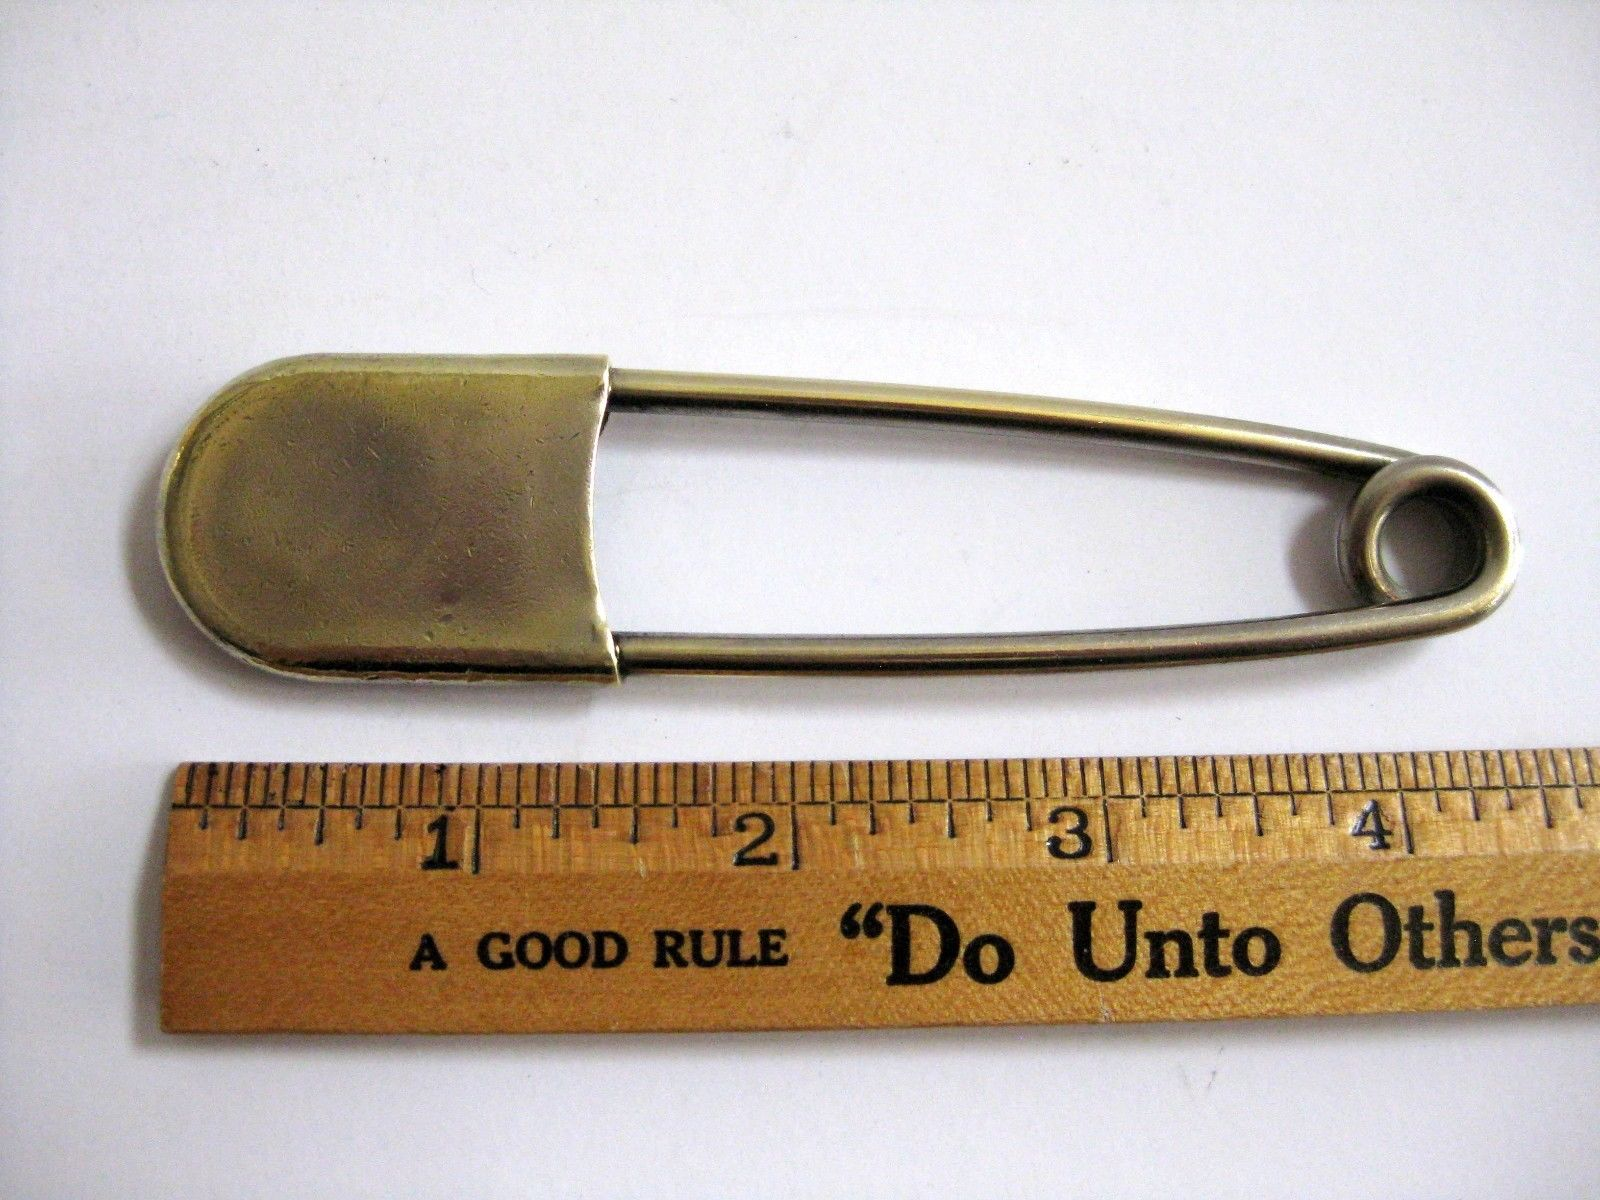 vintage-safety-pin-oversize-4-brass-tone-metal-horse-blanket-kilt-laundry-3934cba6cb537a05a15cae4fbc1d71a1